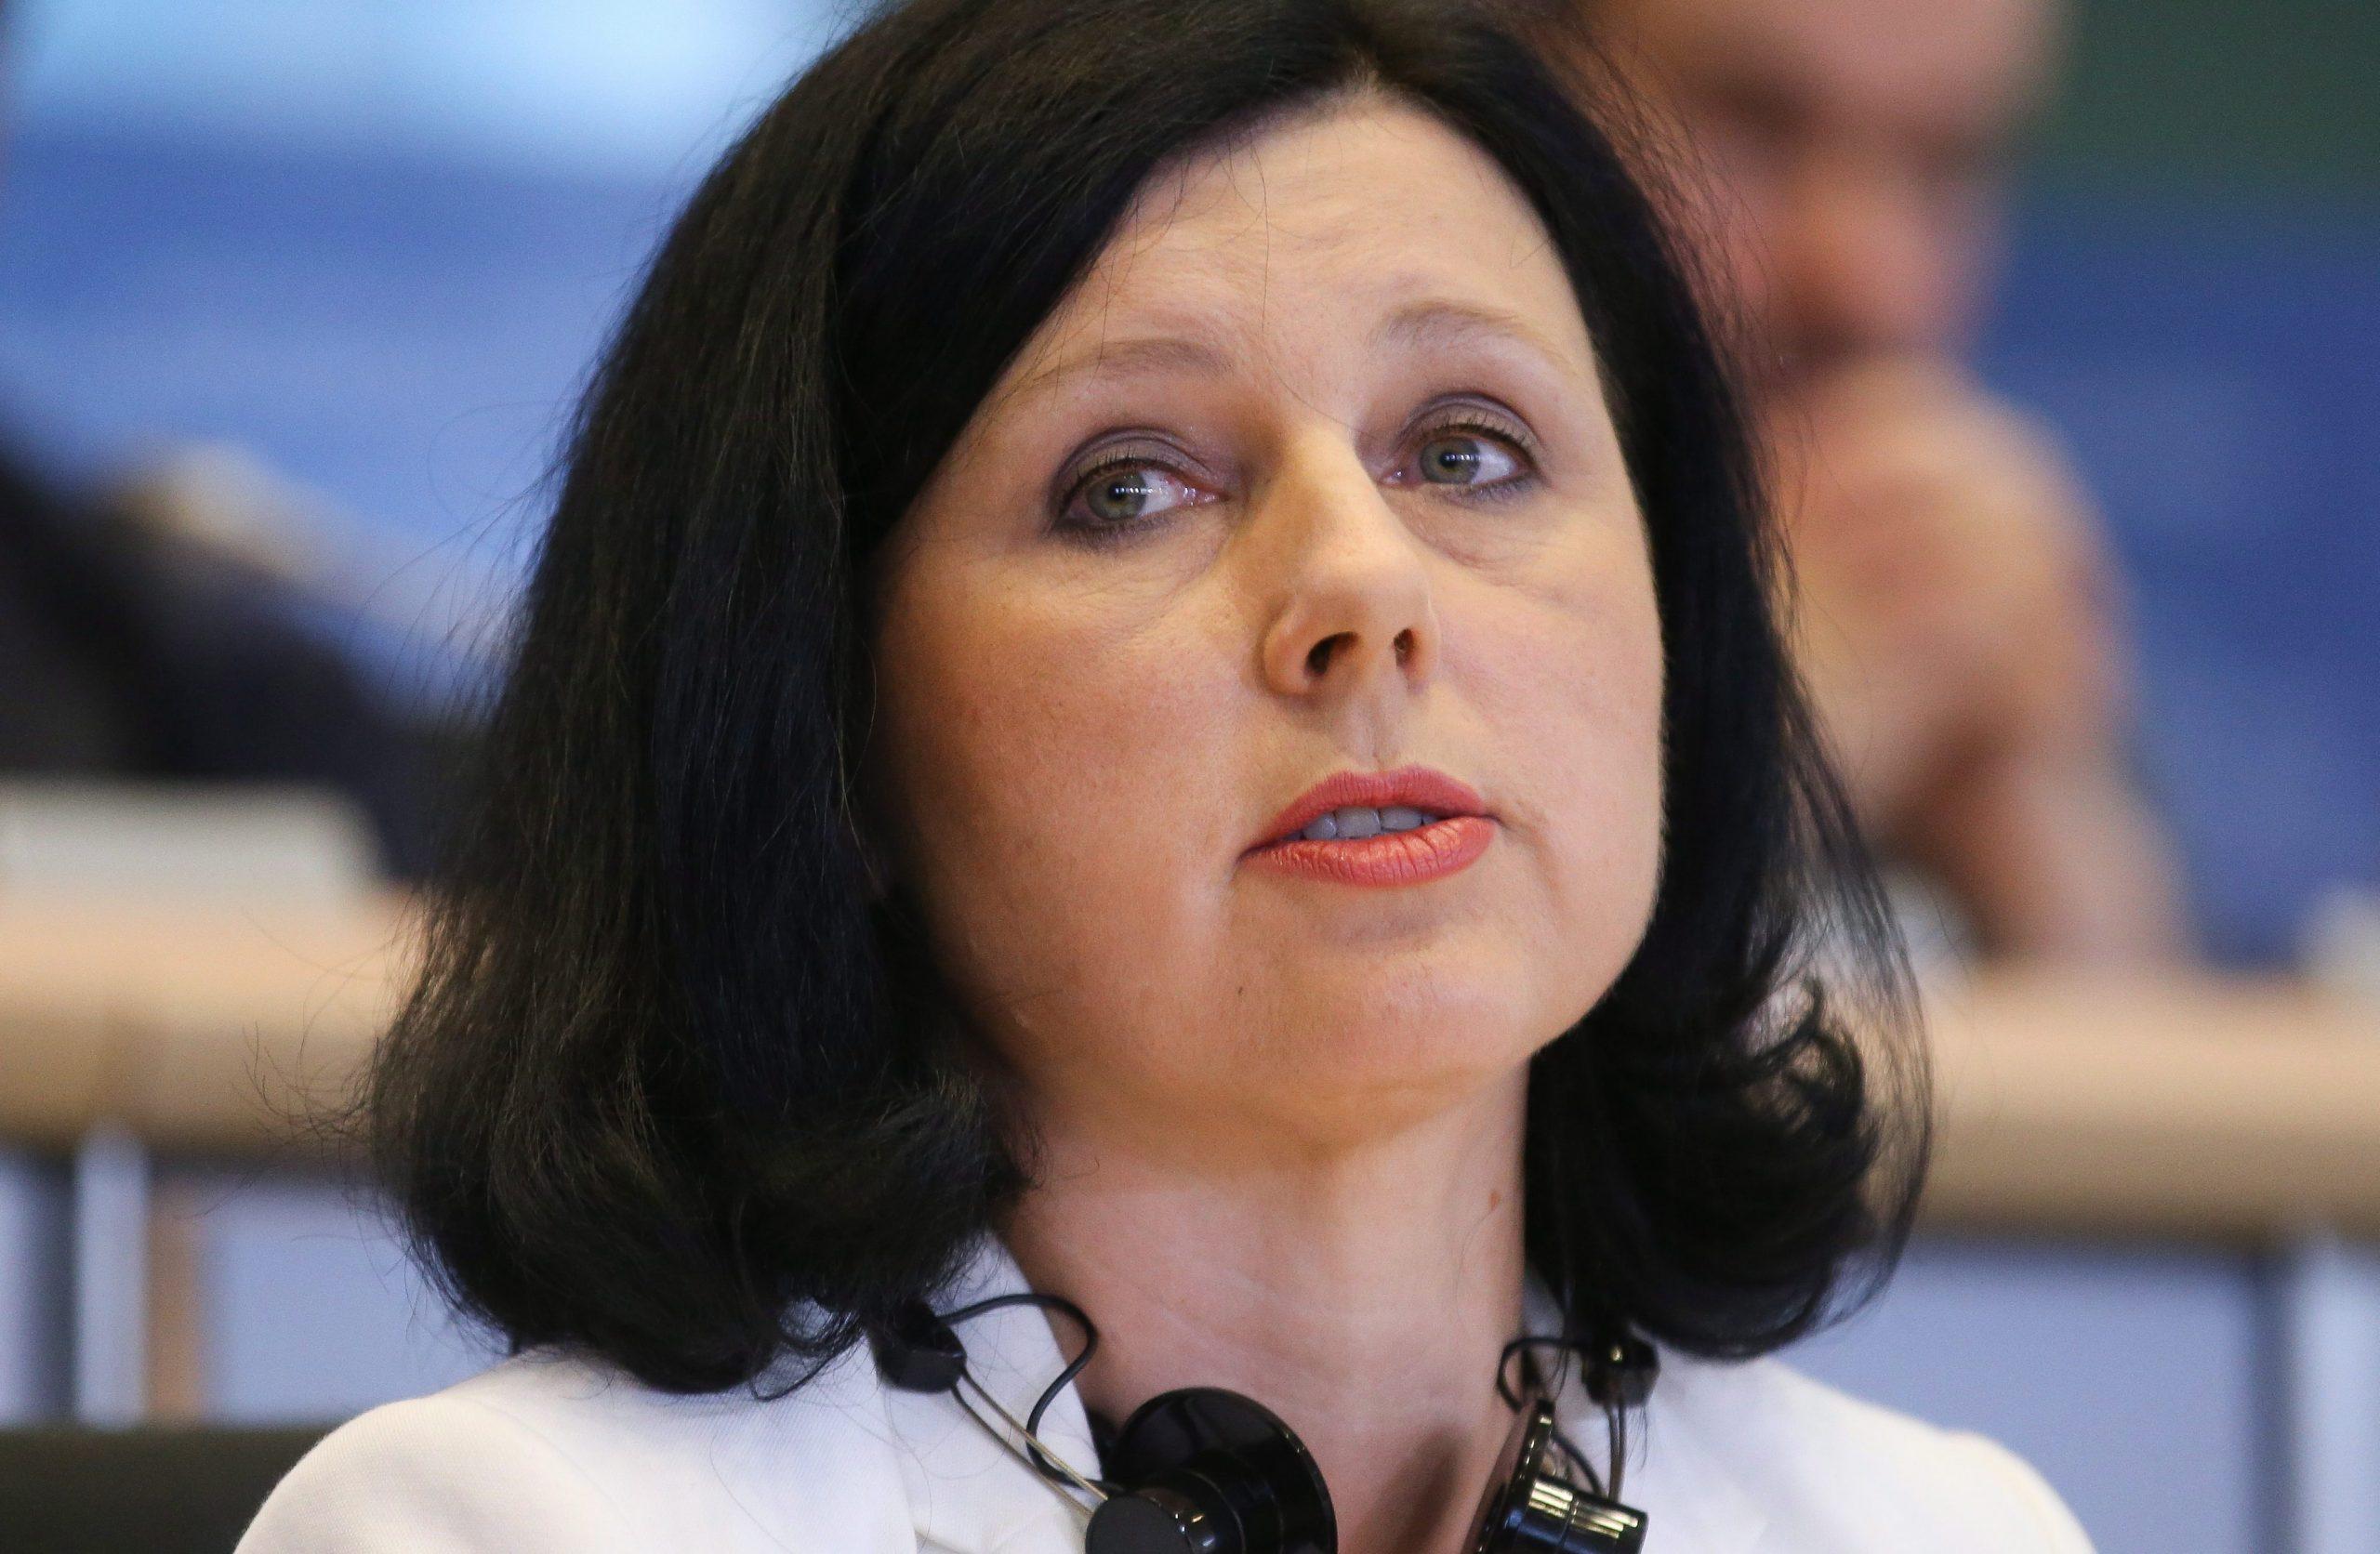 Orbán Demands EC Vice President Jourová's Resignation Over 'Sick Democracy' Comment